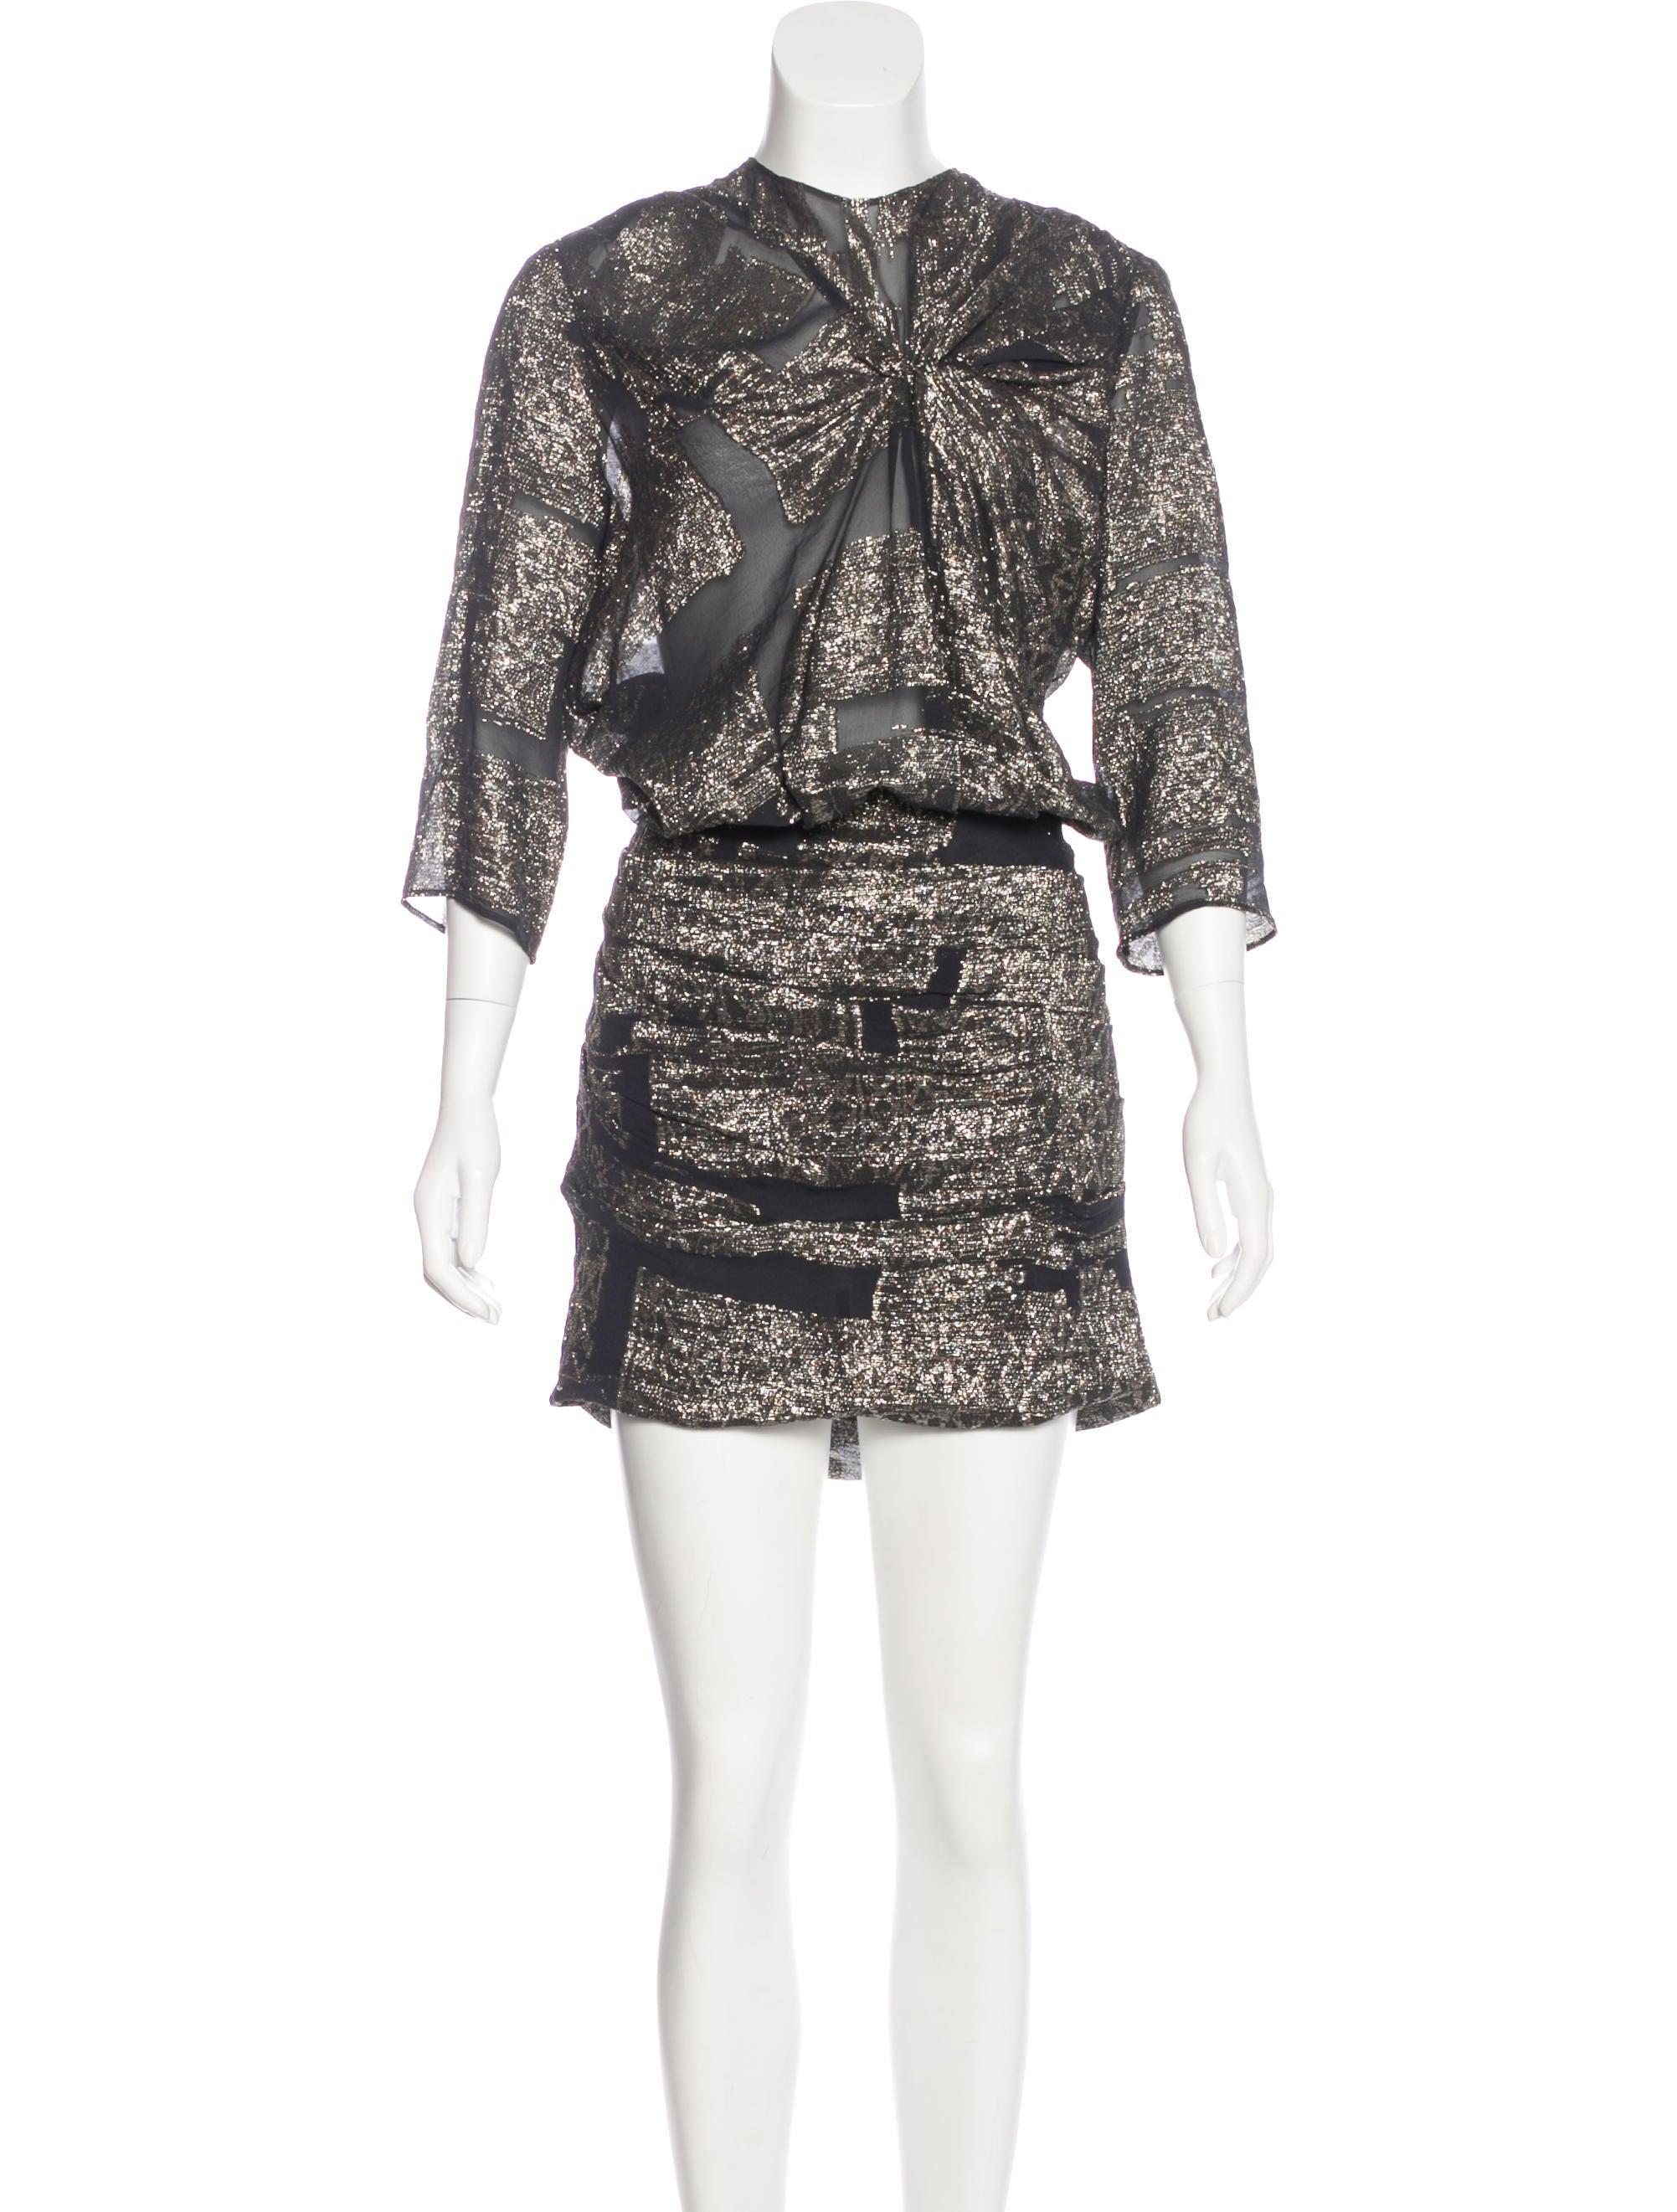 Isabel marant silk metallic dress clothing isa44938 for Isabel marant shirt dress